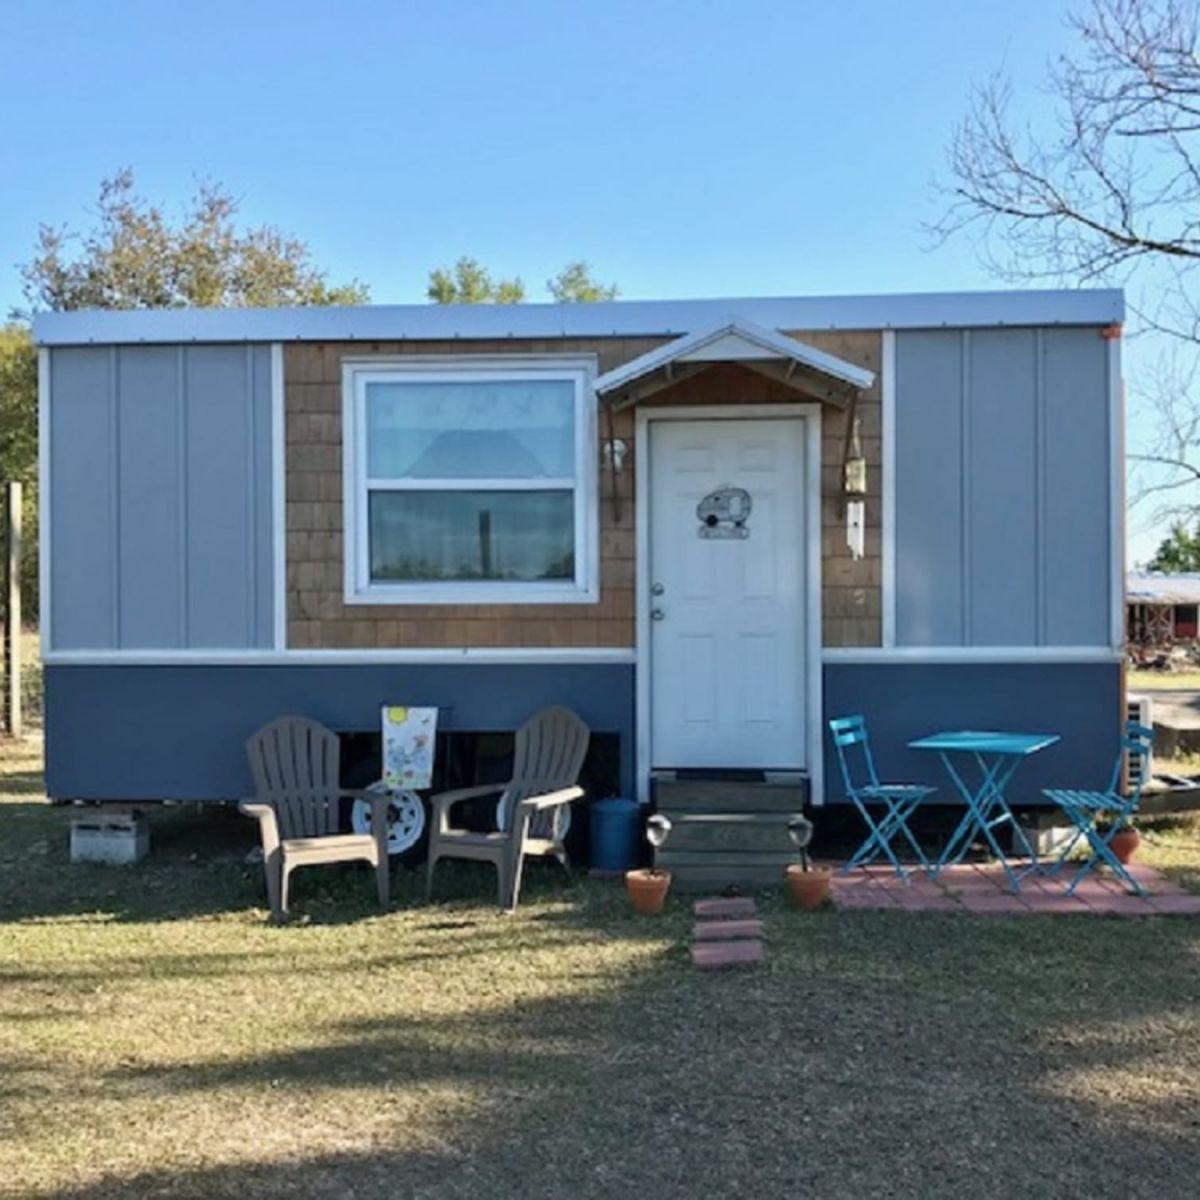 For Sale 2904 Robie Ave Mt Dora Florida 32757 United States